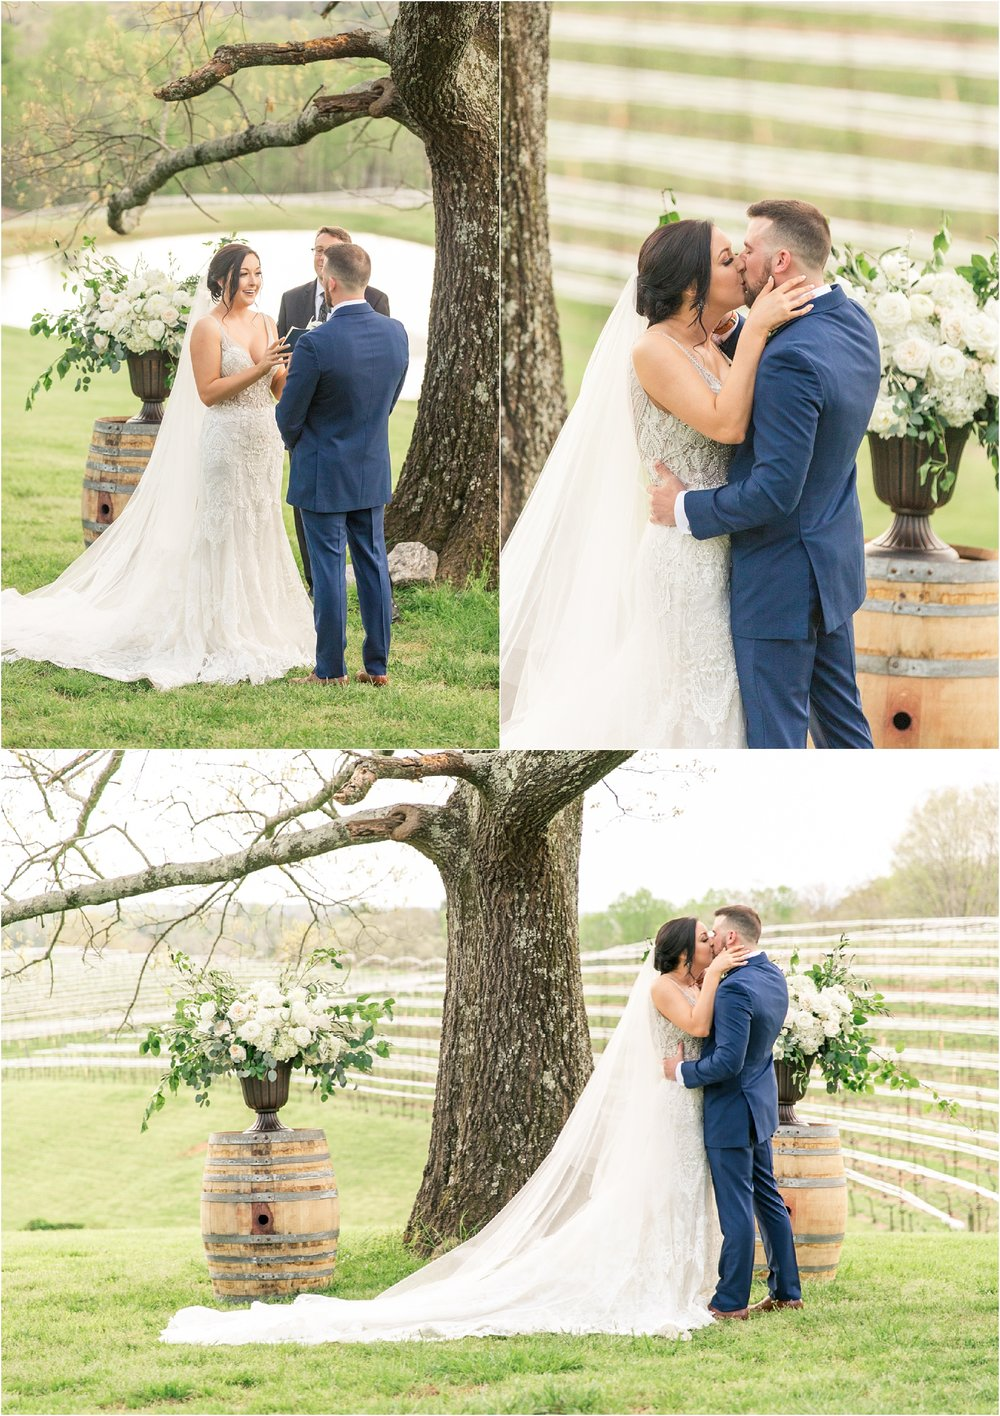 Savannah Eve Photography- Turnbill-Gilgan Wedding- Blog-49.jpg